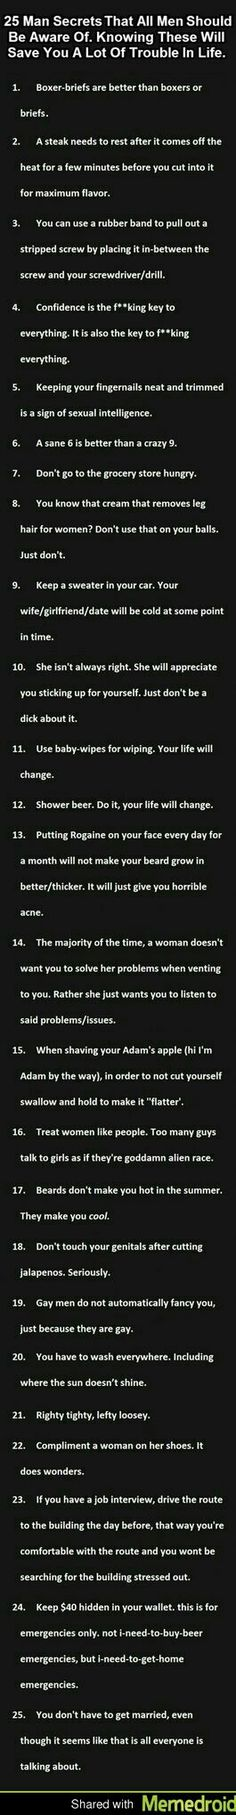 Guy tips